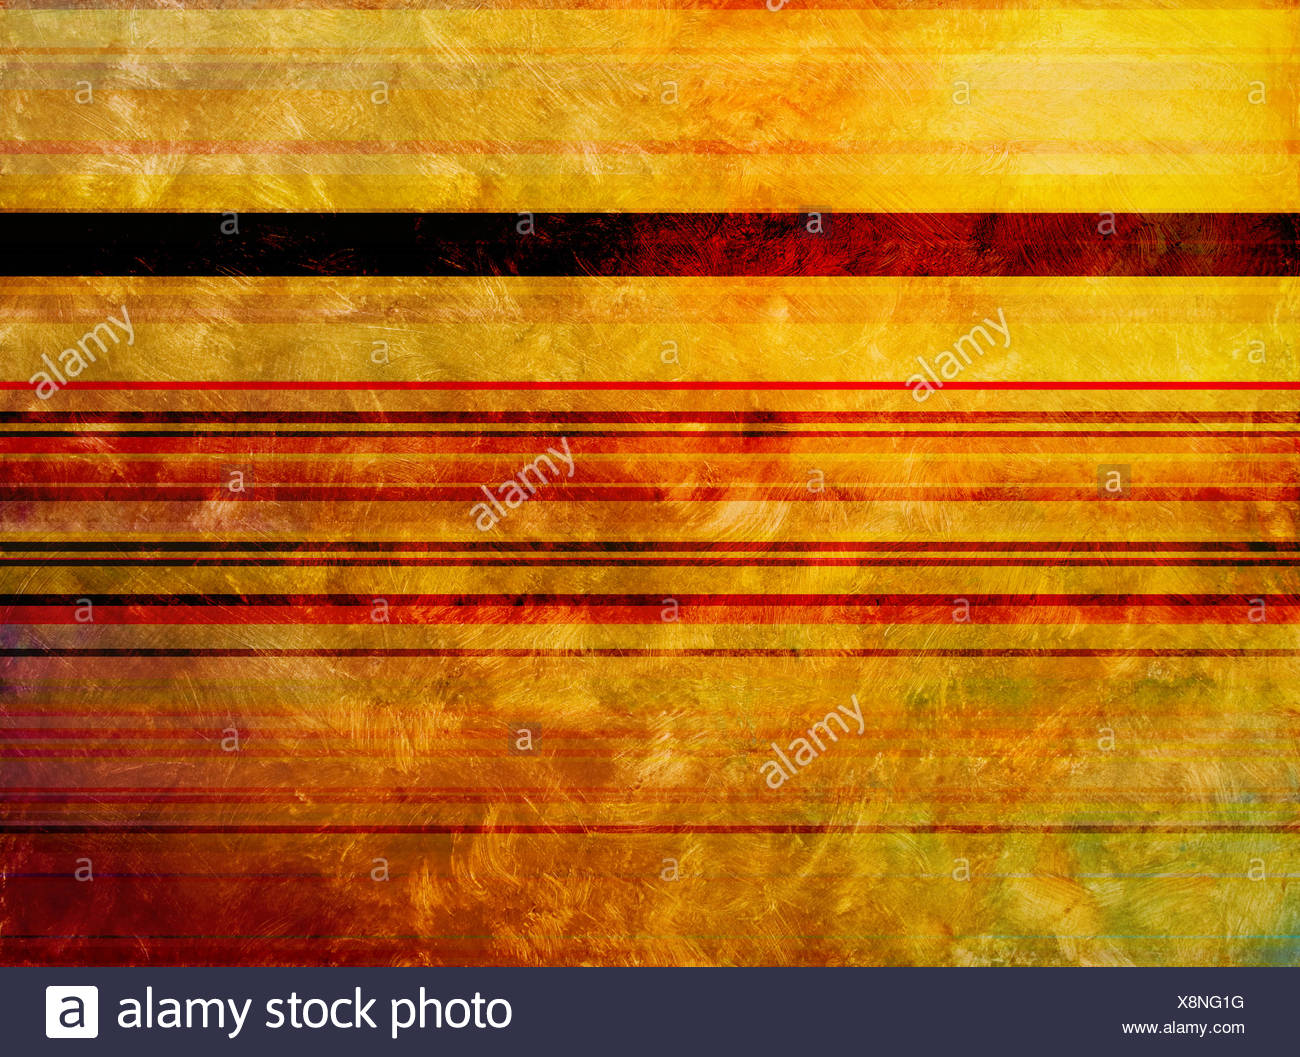 abstract mixed media - Stock Image